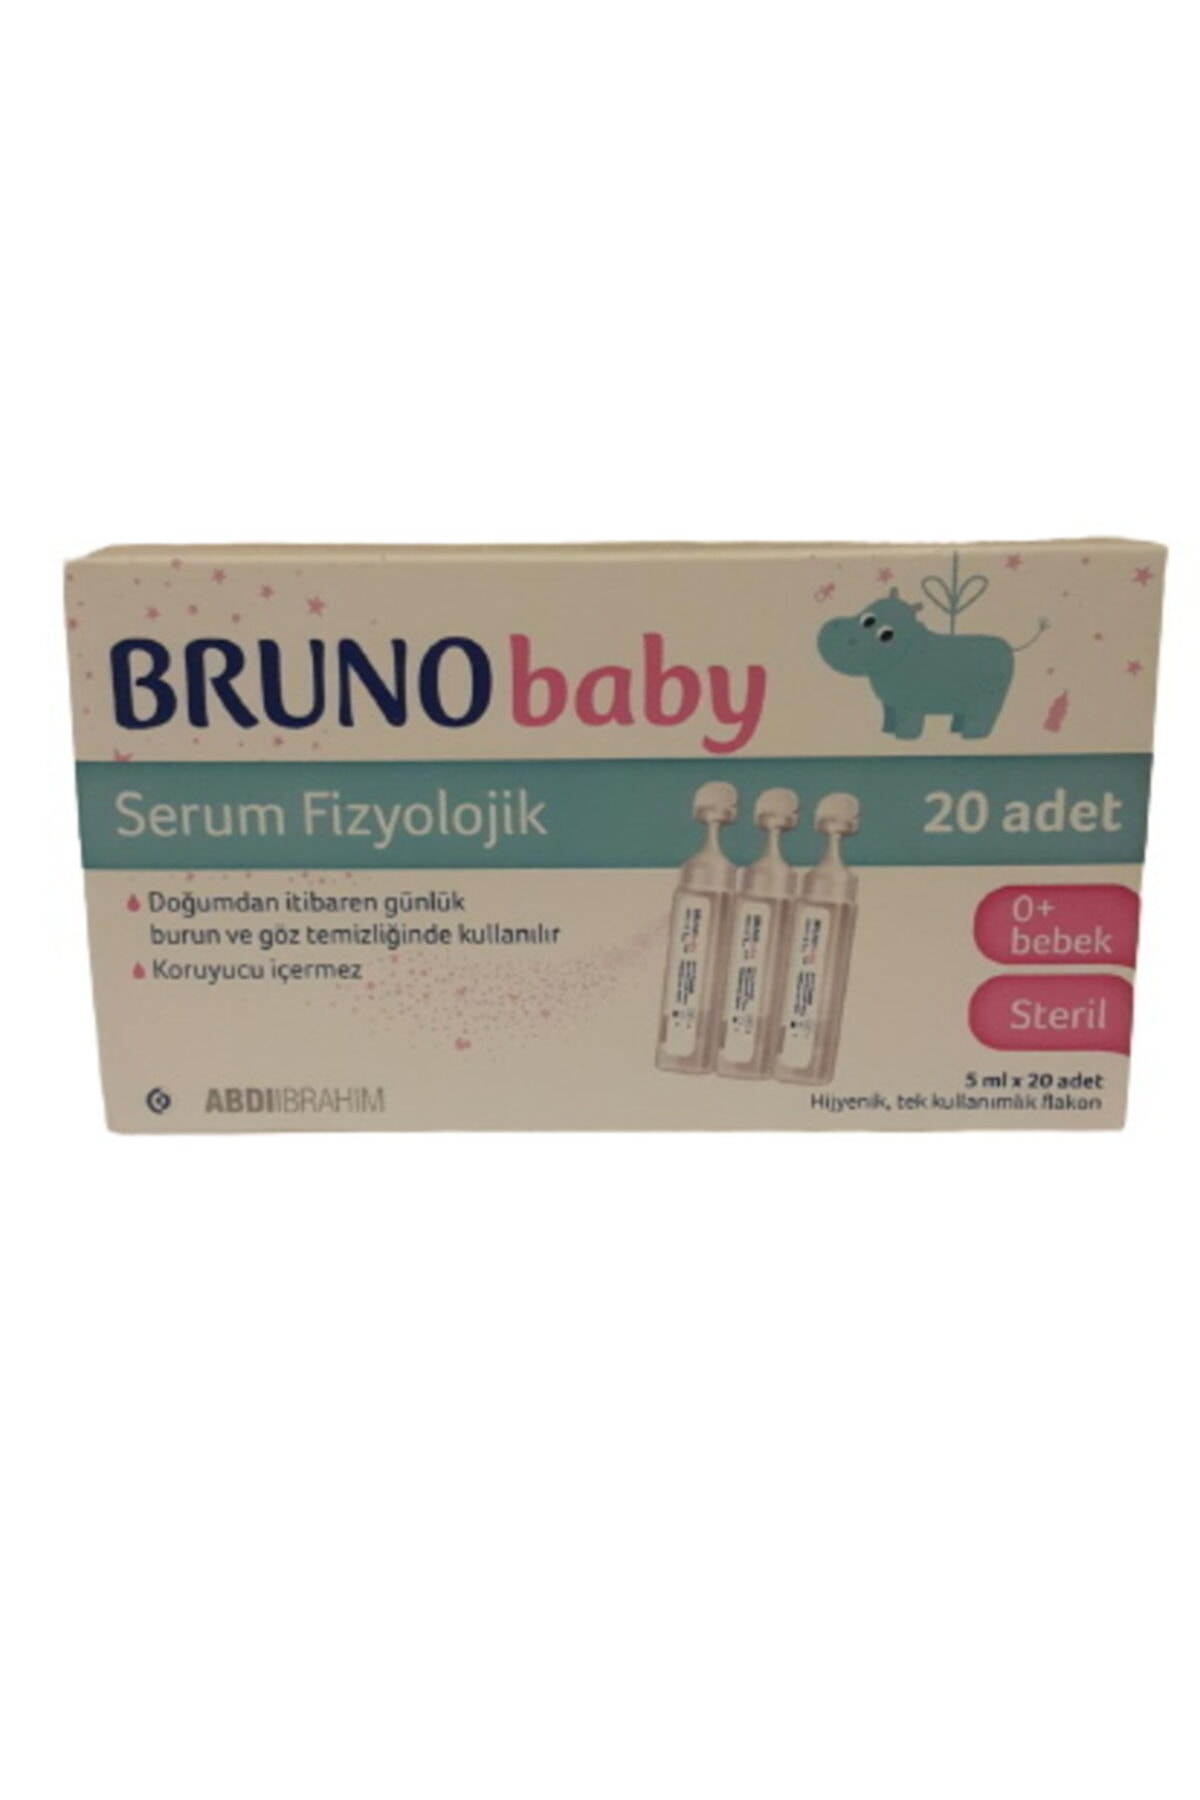 Bruno Baby Serum Fizyolojik Damla 5 ml  X 20 Adet 1